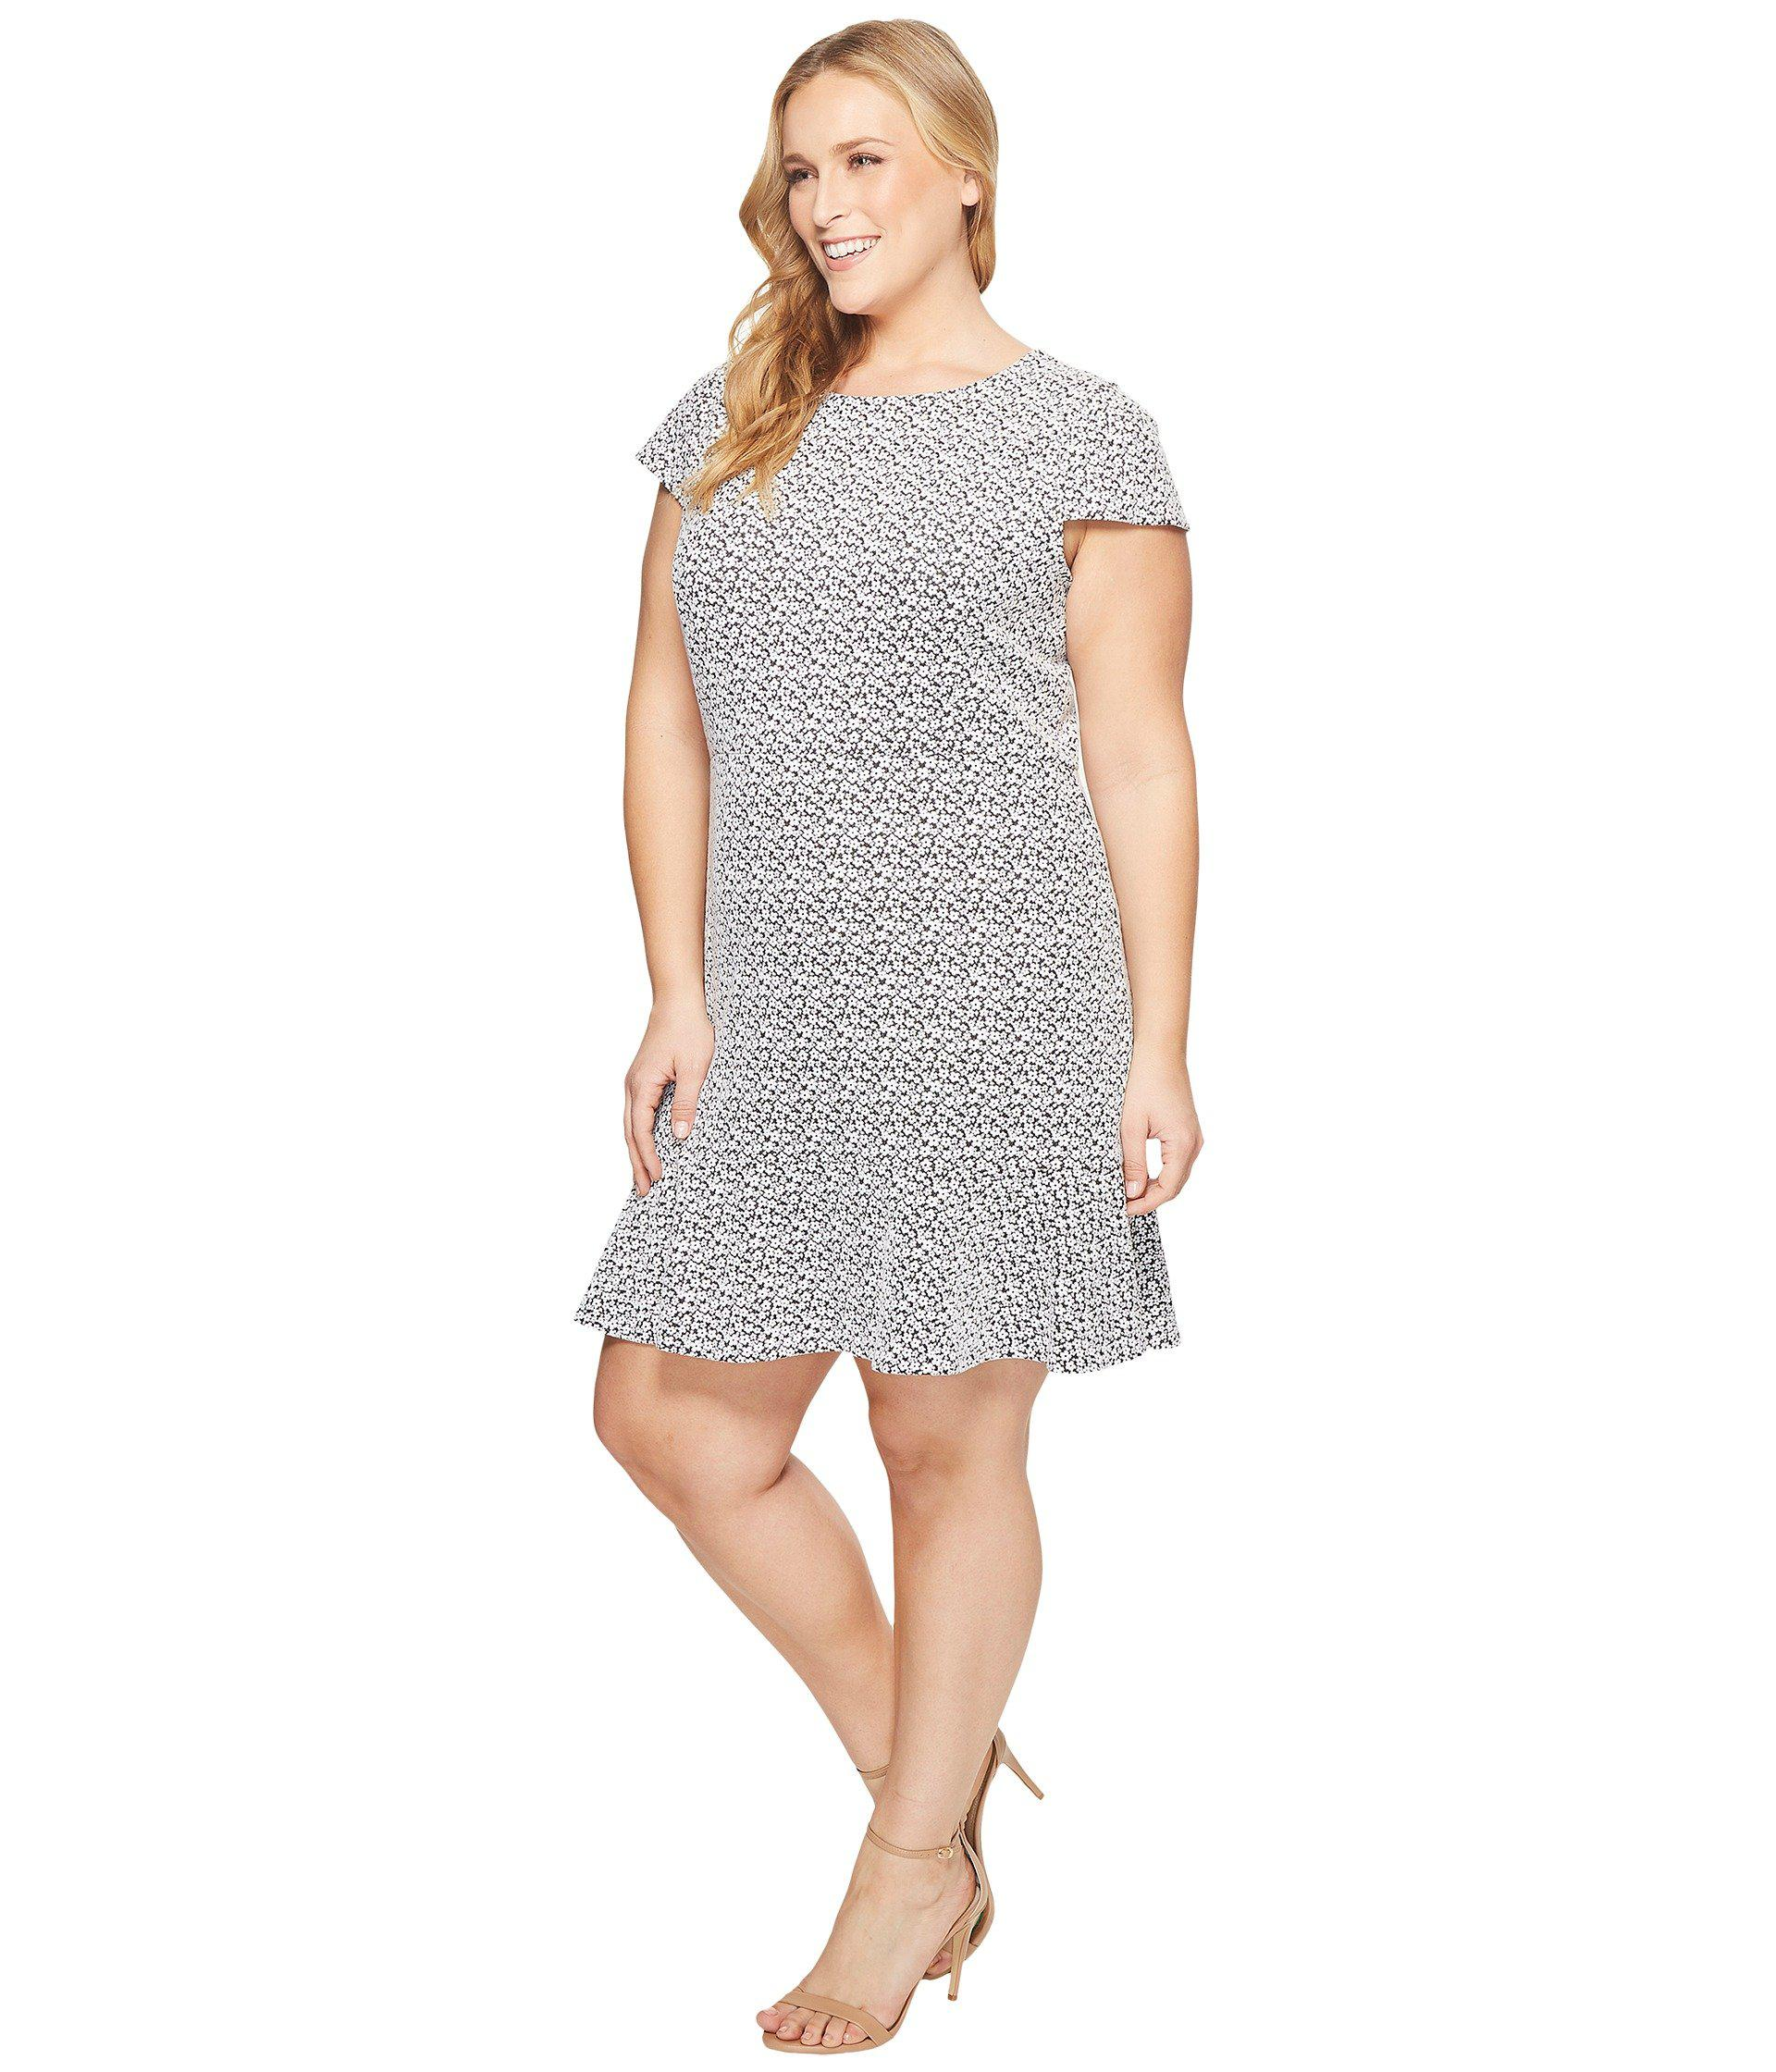 c8059956fbe5c Lyst - MICHAEL Michael Kors Plus Size Jacquard Knit Short Sleeve Flounce  Dress - Save 51%